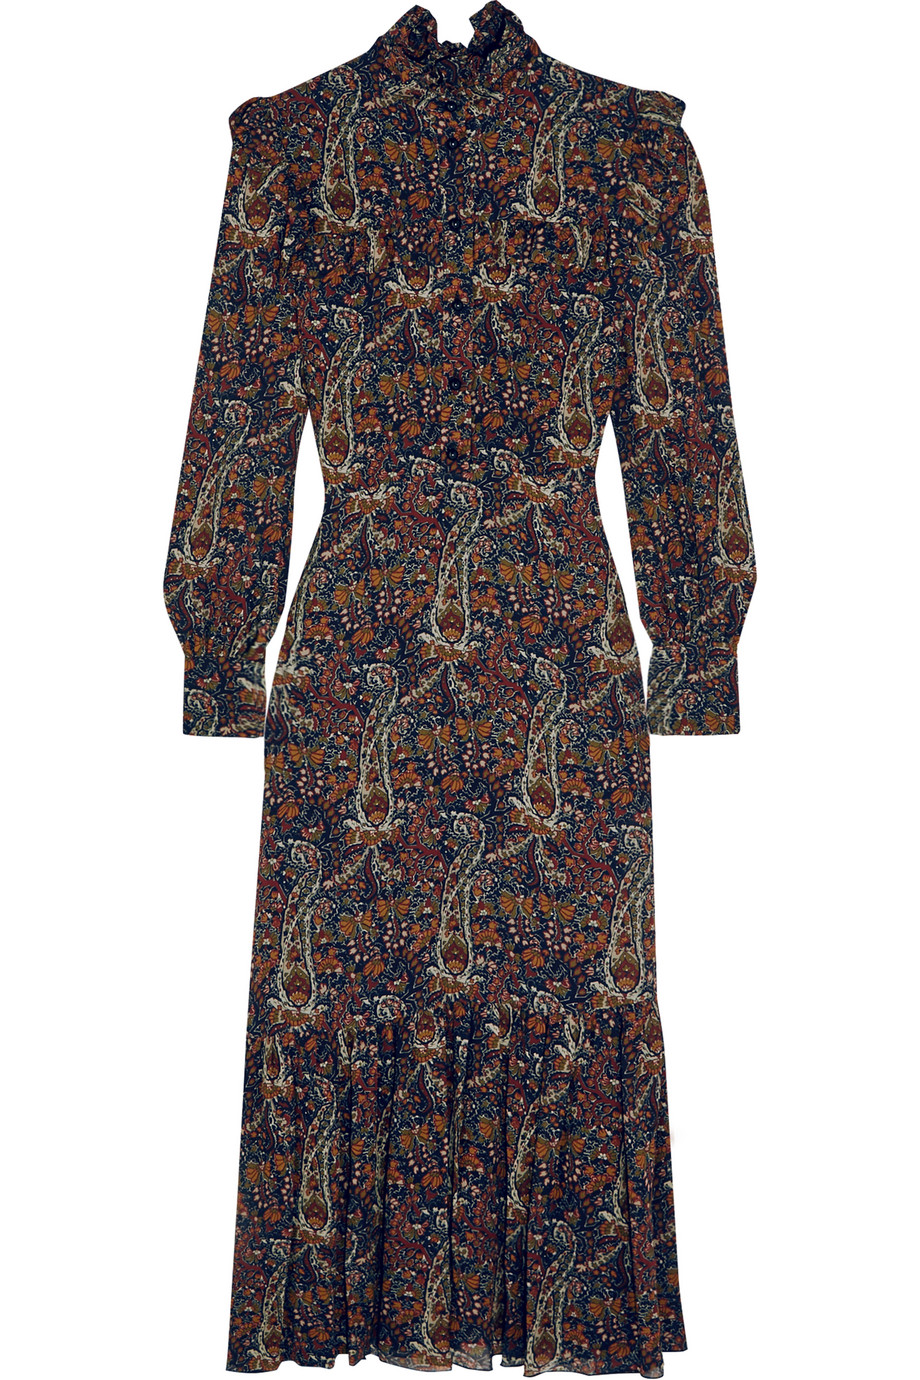 Saint Laurent Ruffled Paisley-Print Crepe Midi Dress, Size: 34